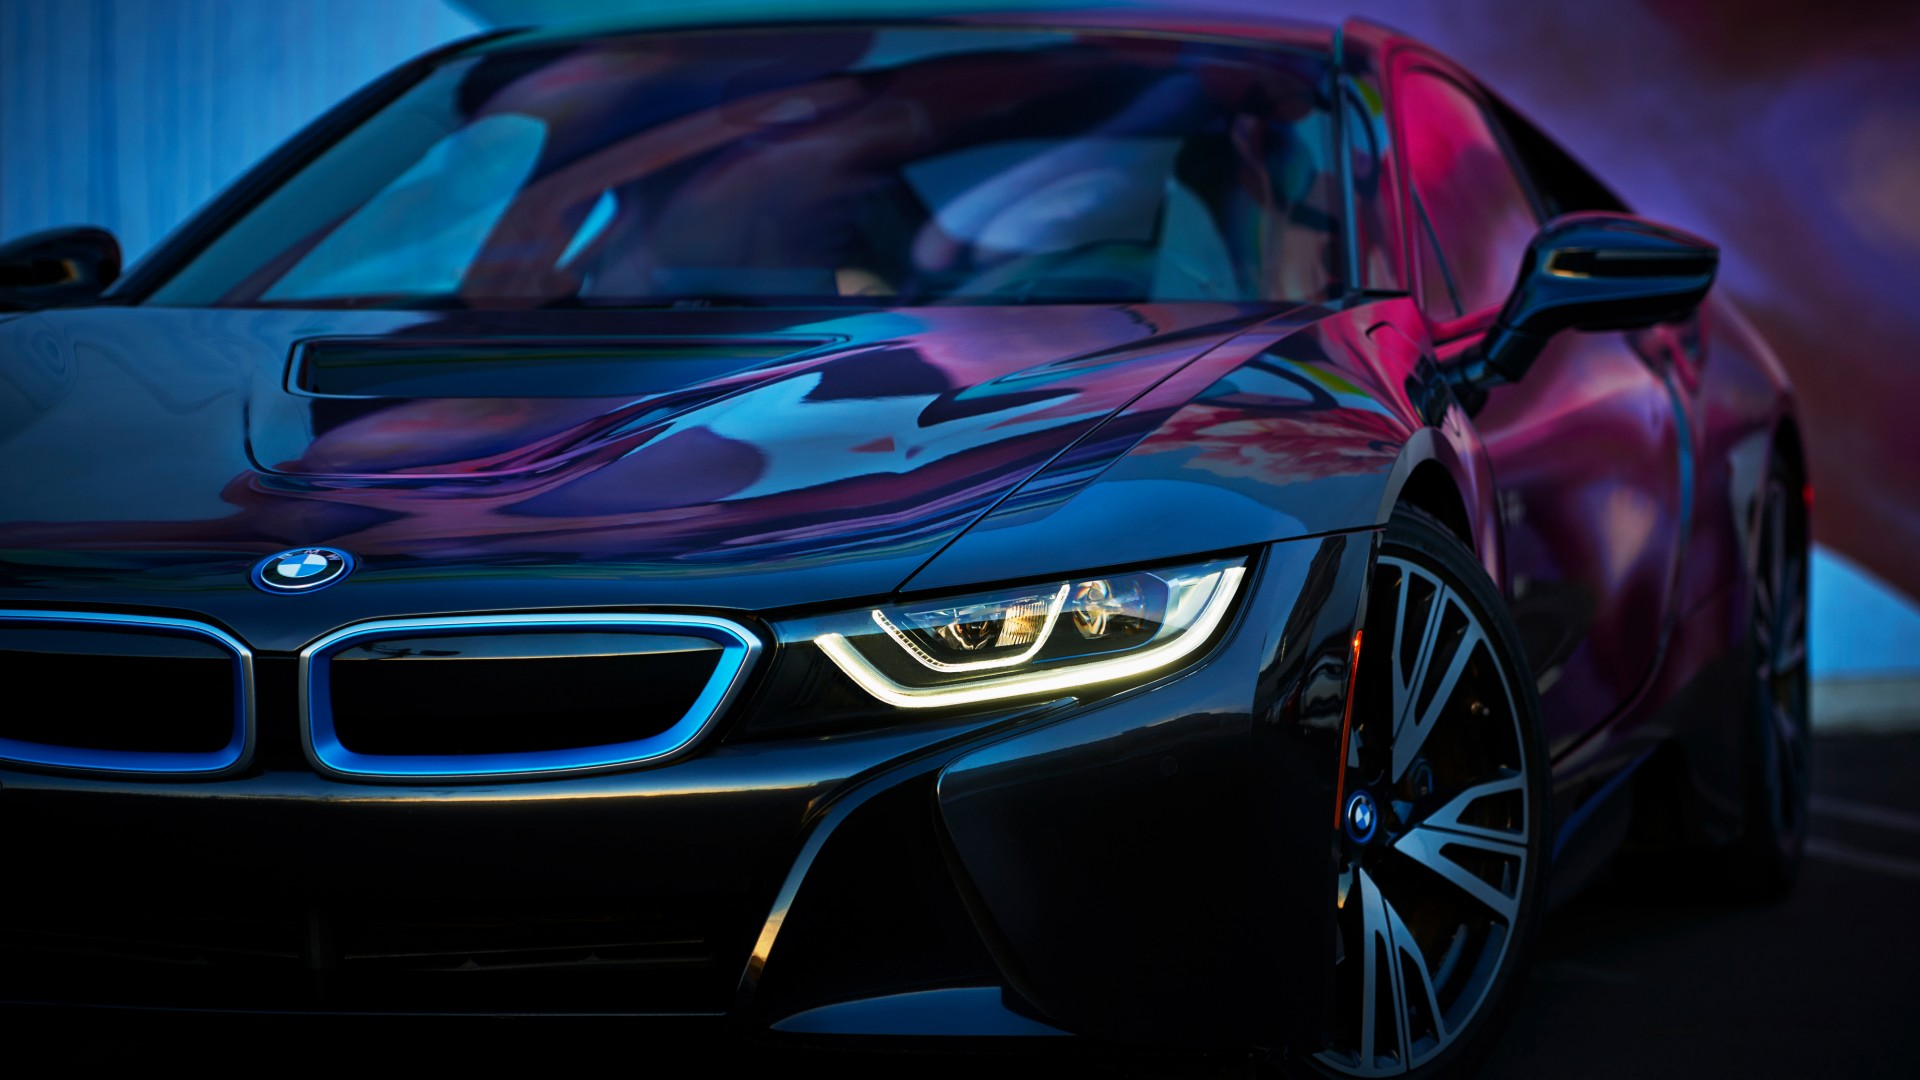 2018 BMW I8 4K Wallpaper